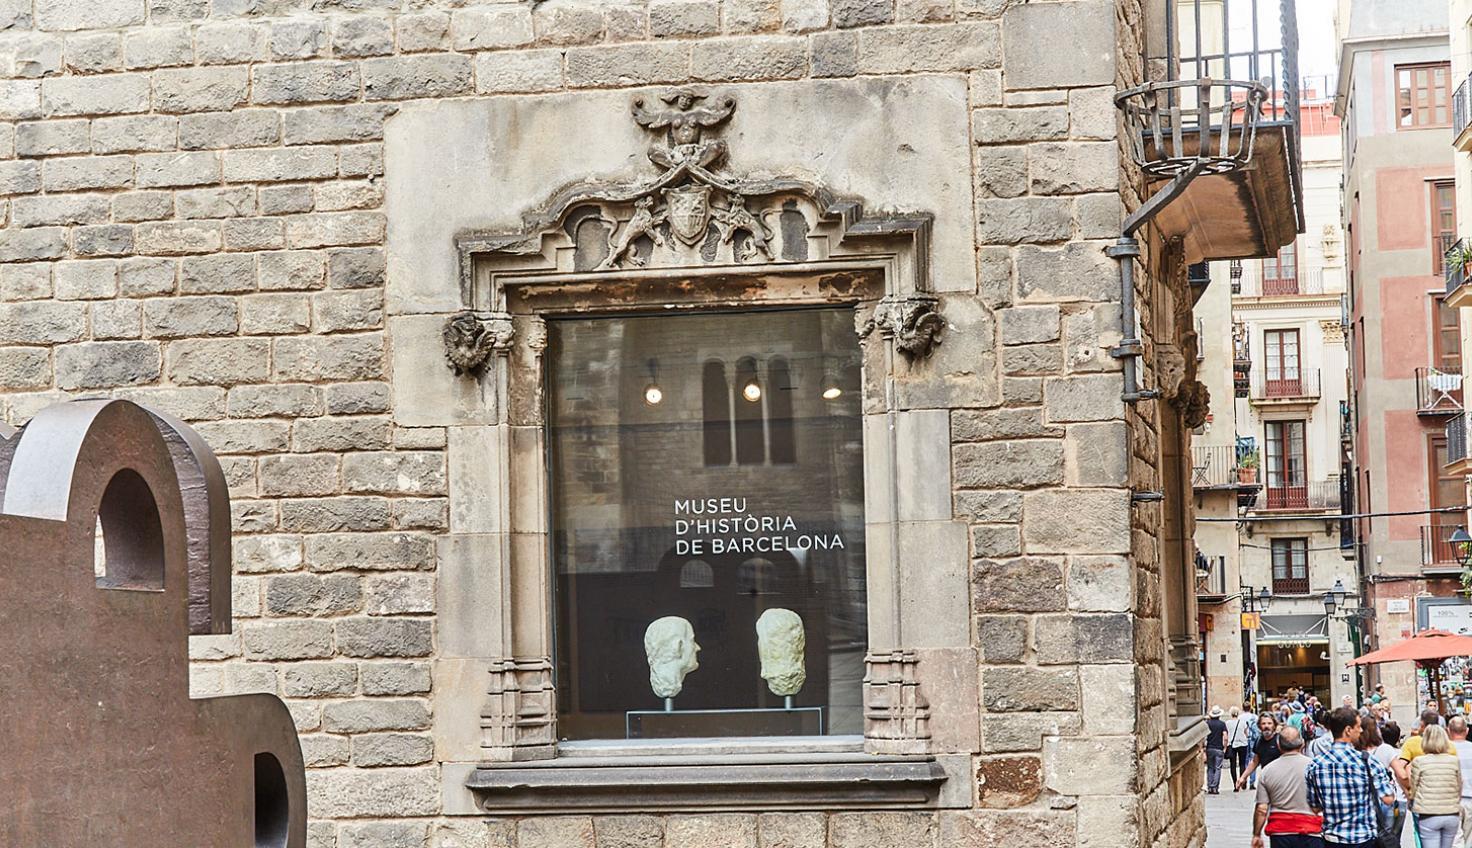 Photo MUHBA – Barcelona City History Museum